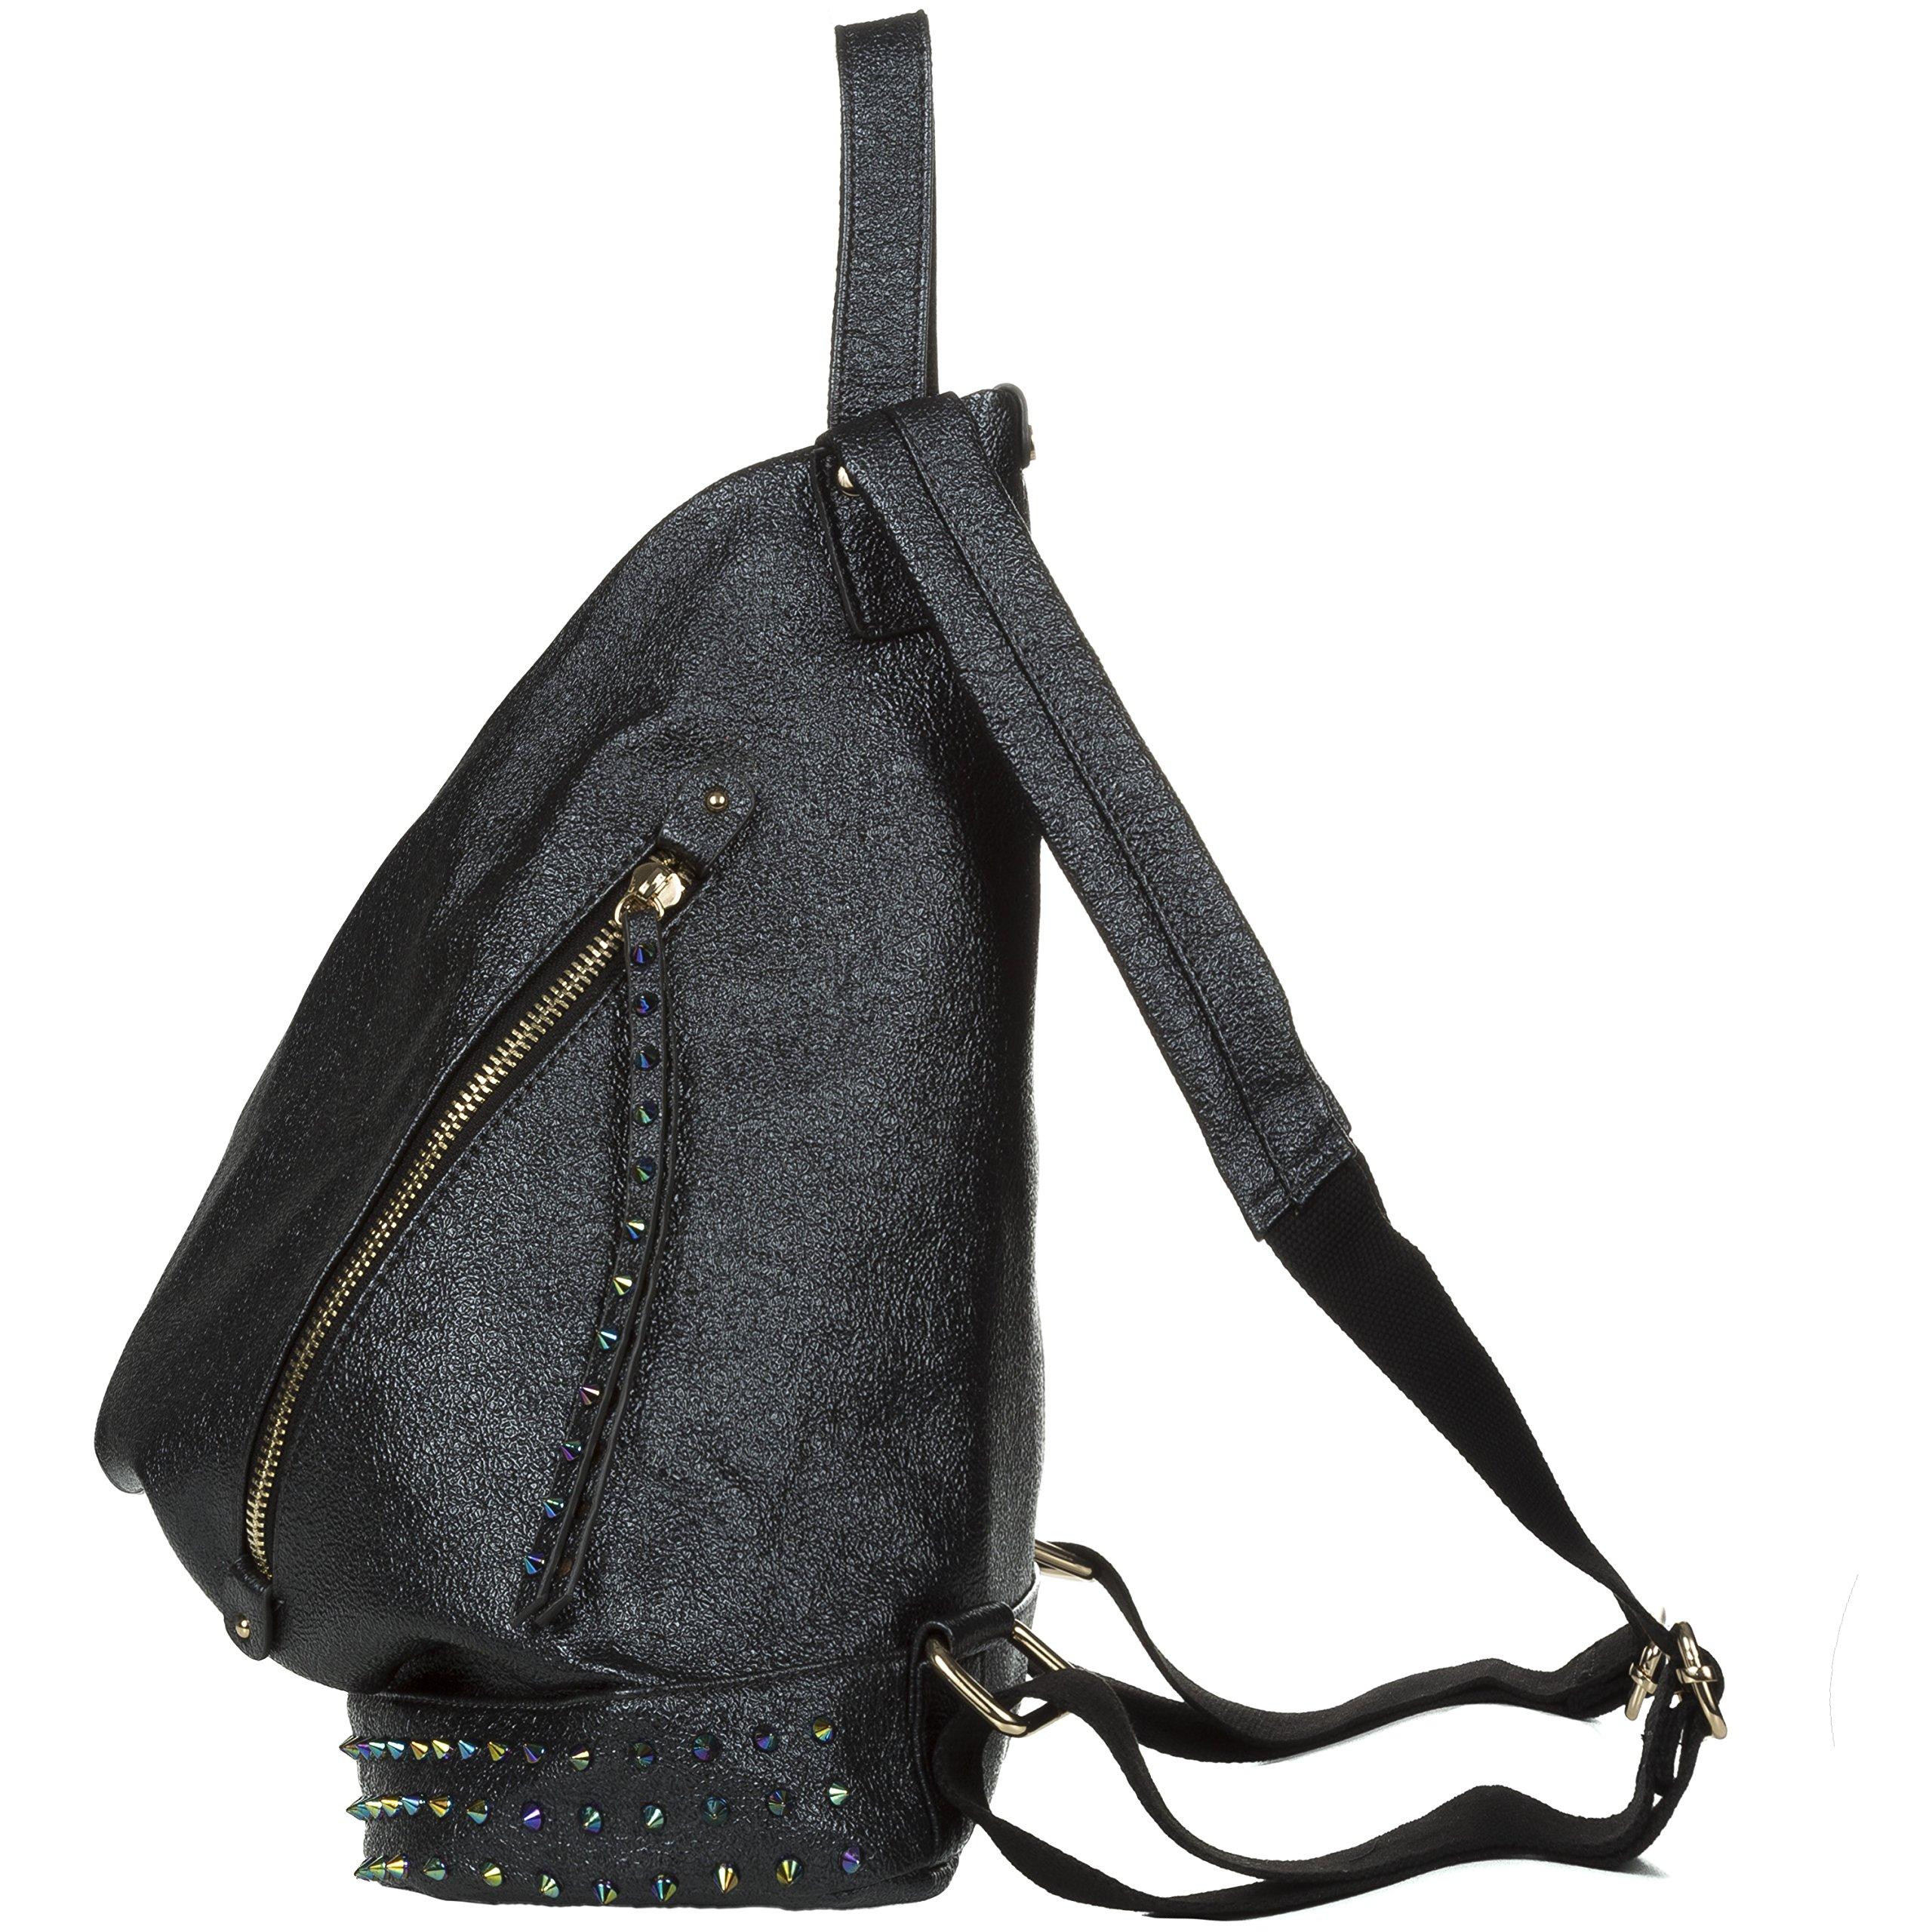 Handbag Republic Fashion Backpack Vegan Leather Travel Bag Easy Carry For Women by Handbag Republic (Image #3)